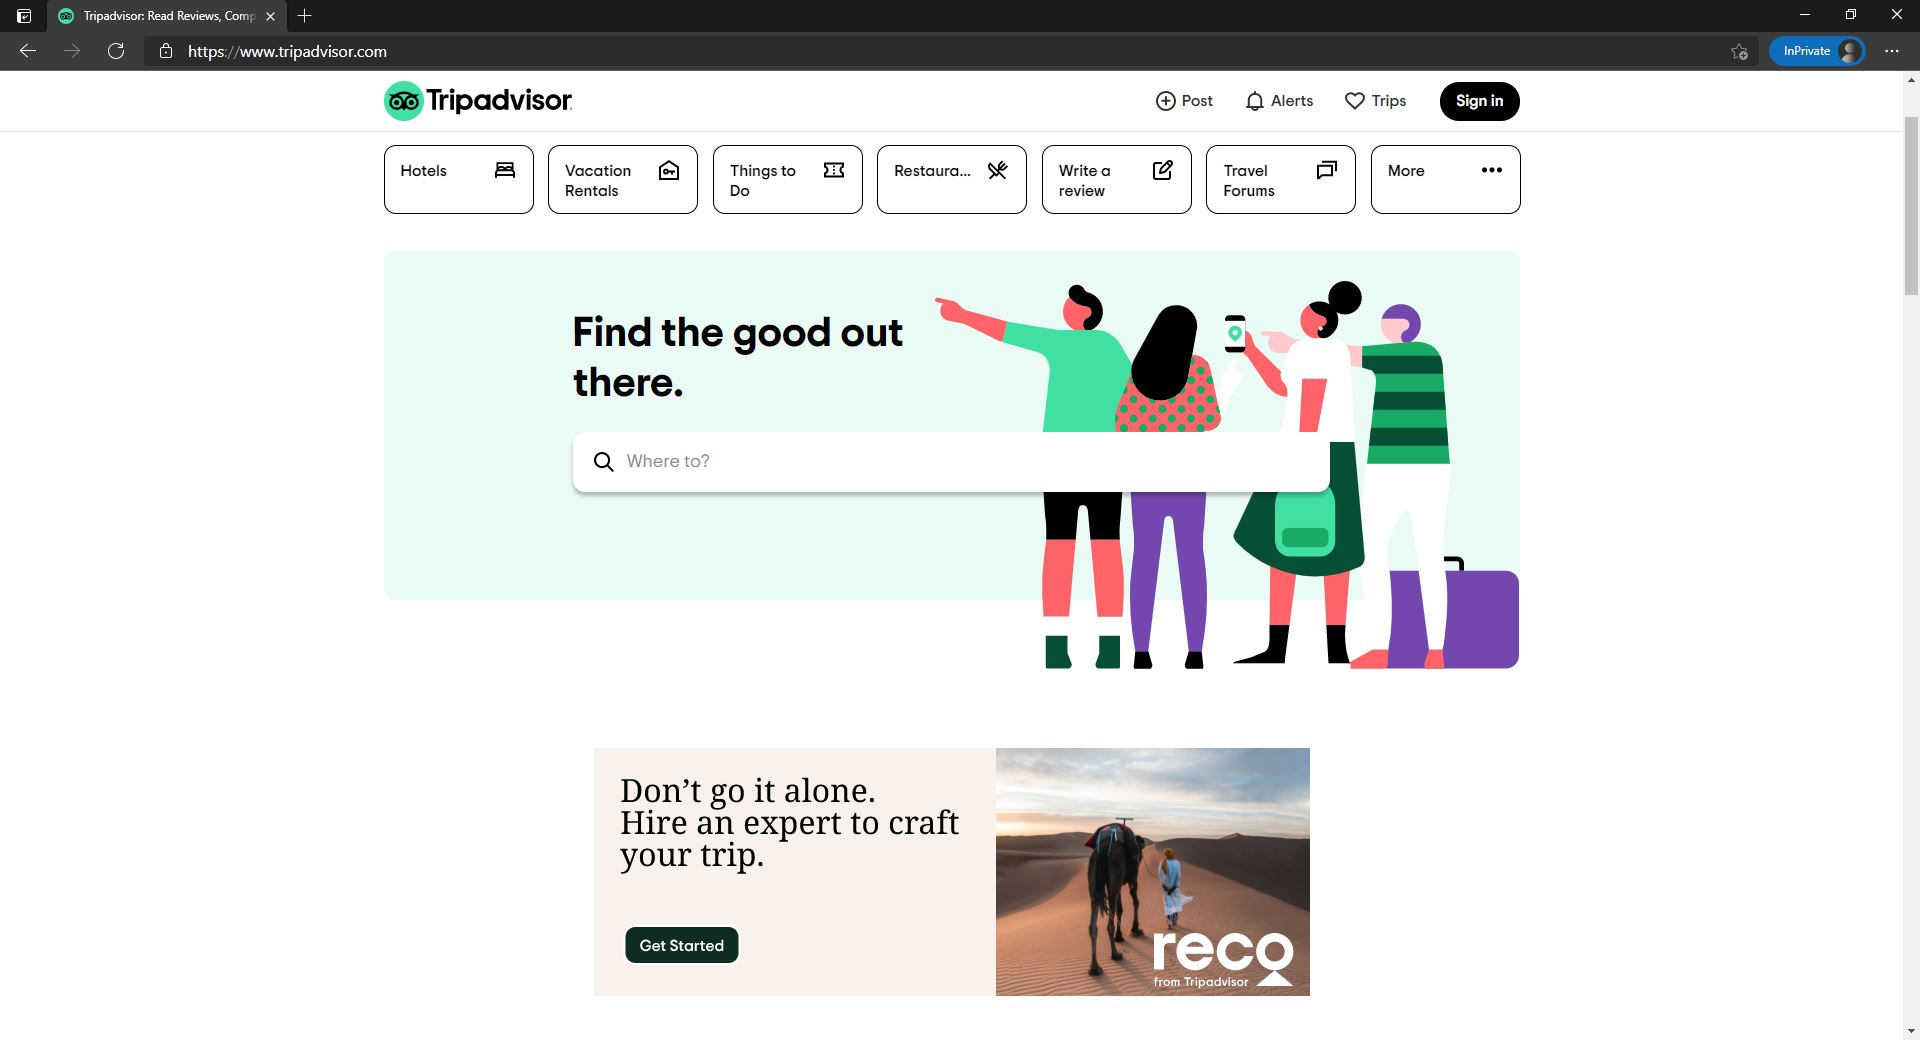 TripAdvisor new website with simplicity concept